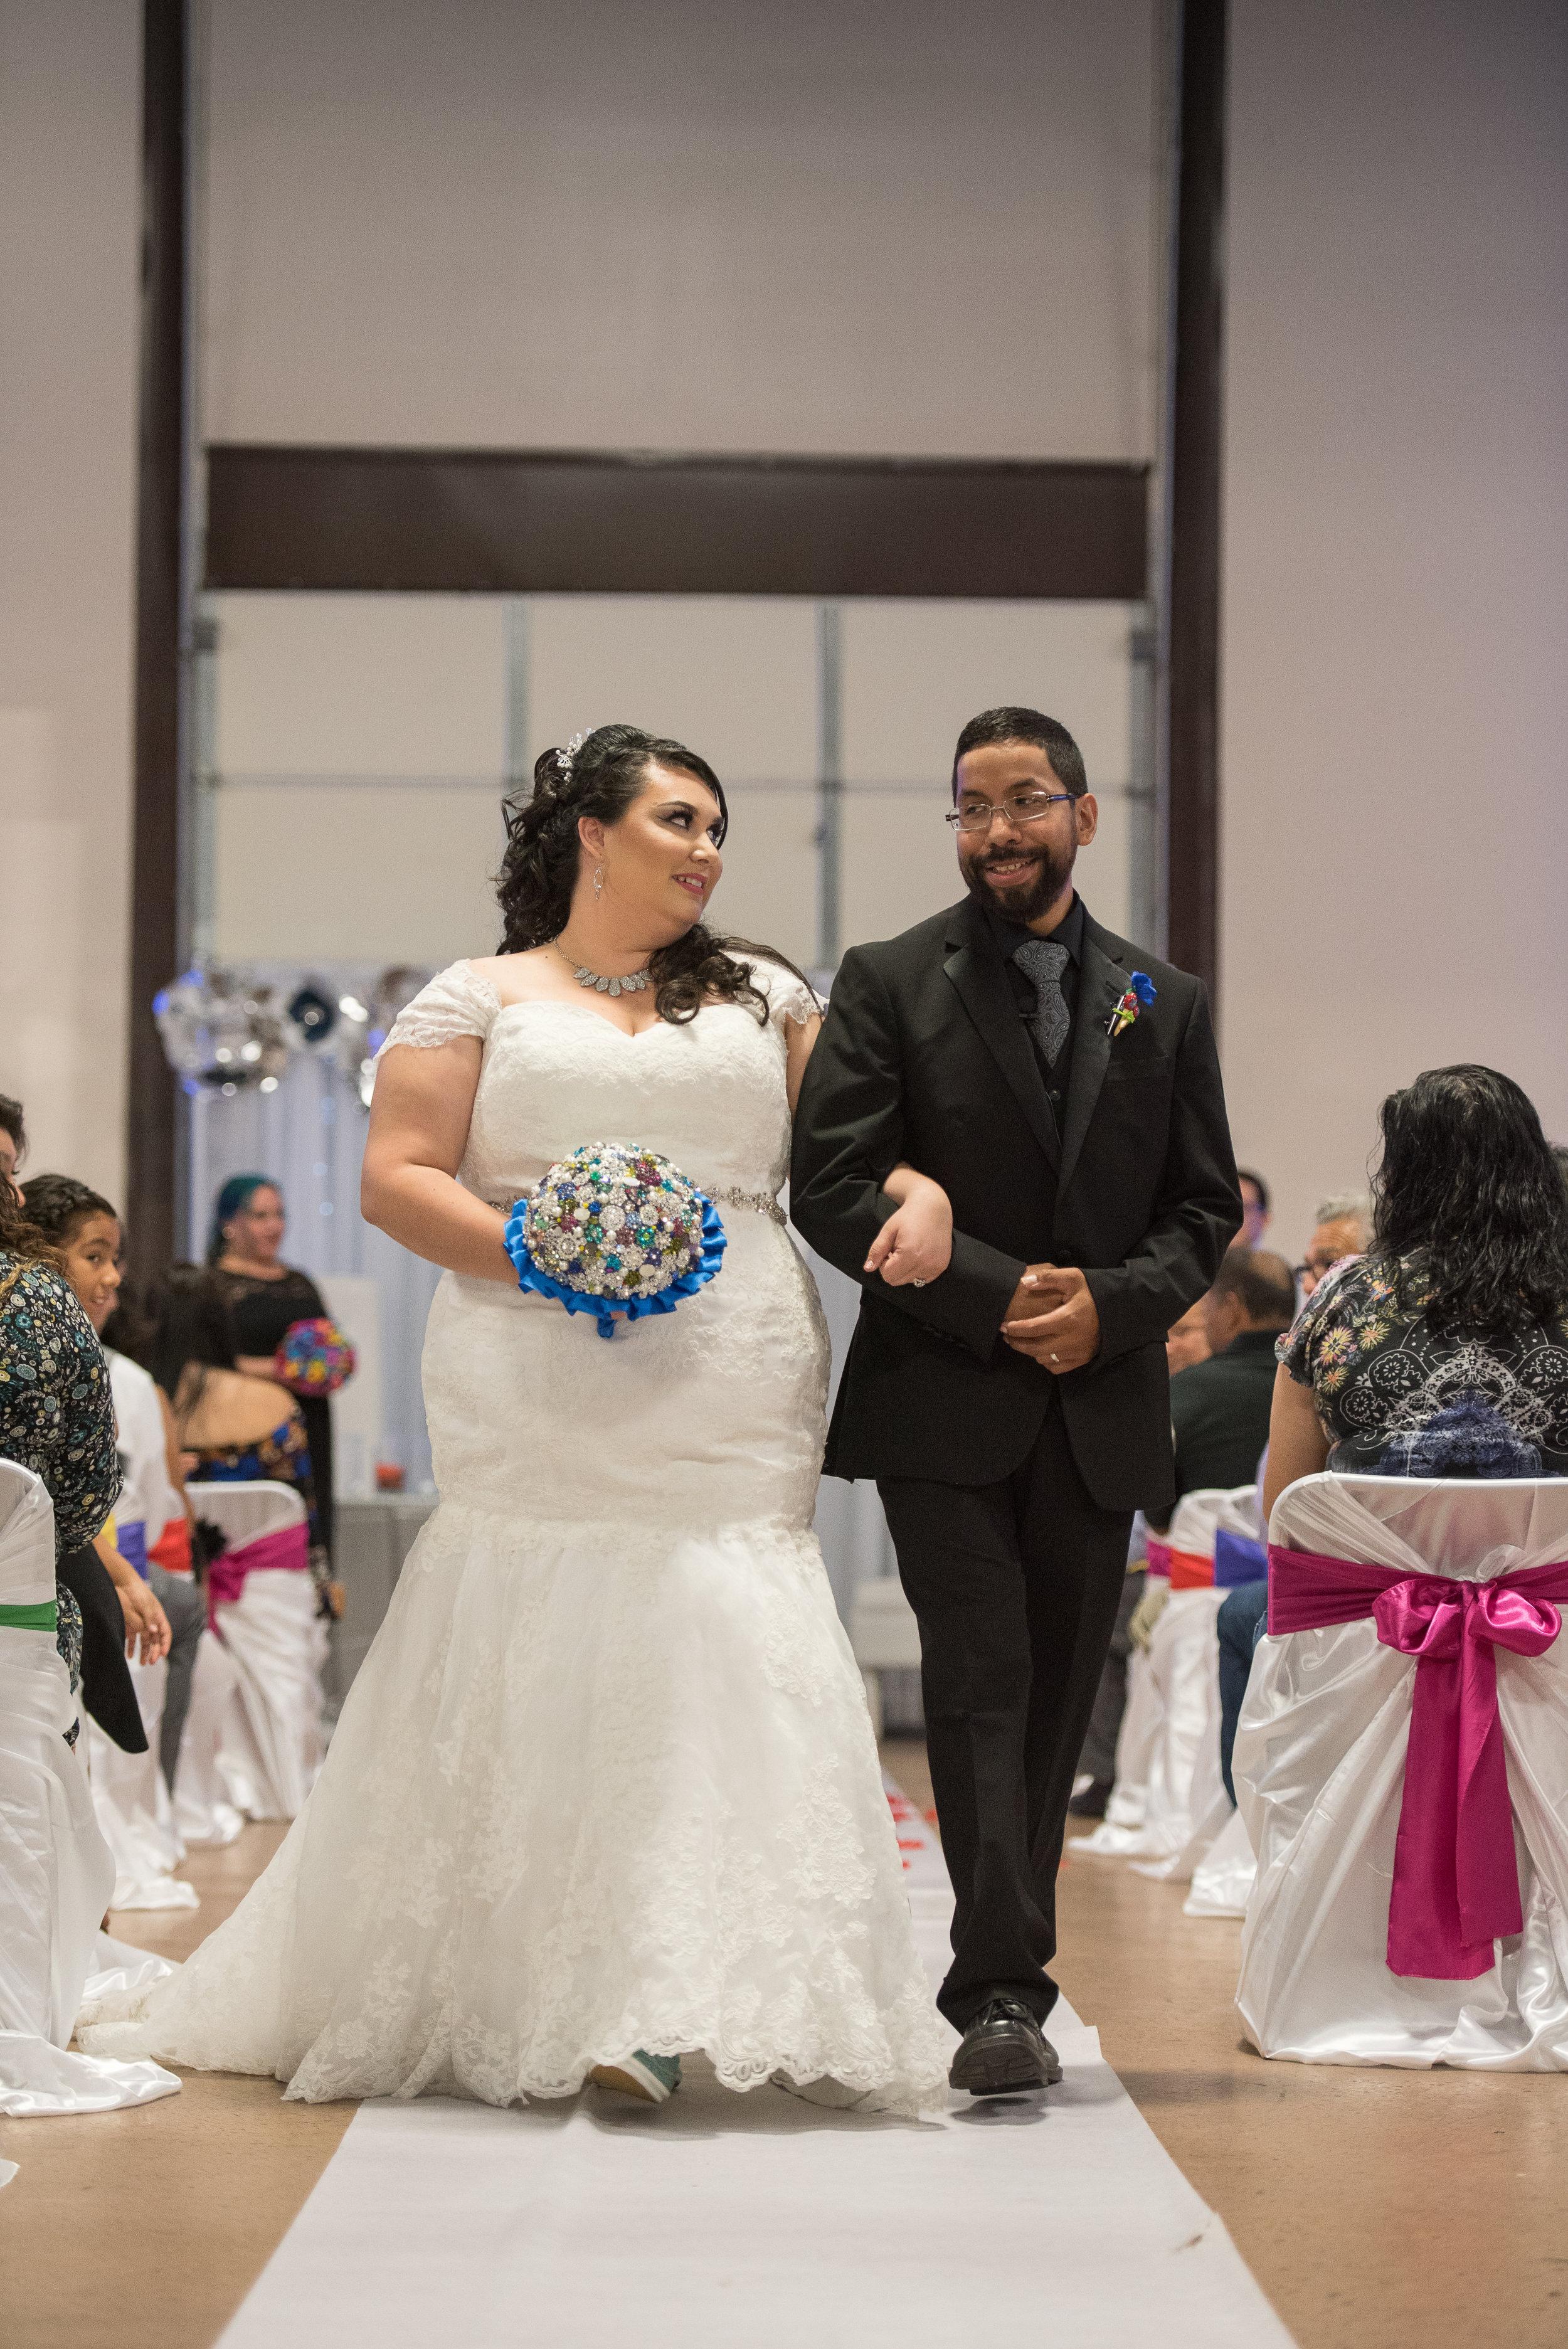 Leal Wedding Mira Visu Photography-911.jpg